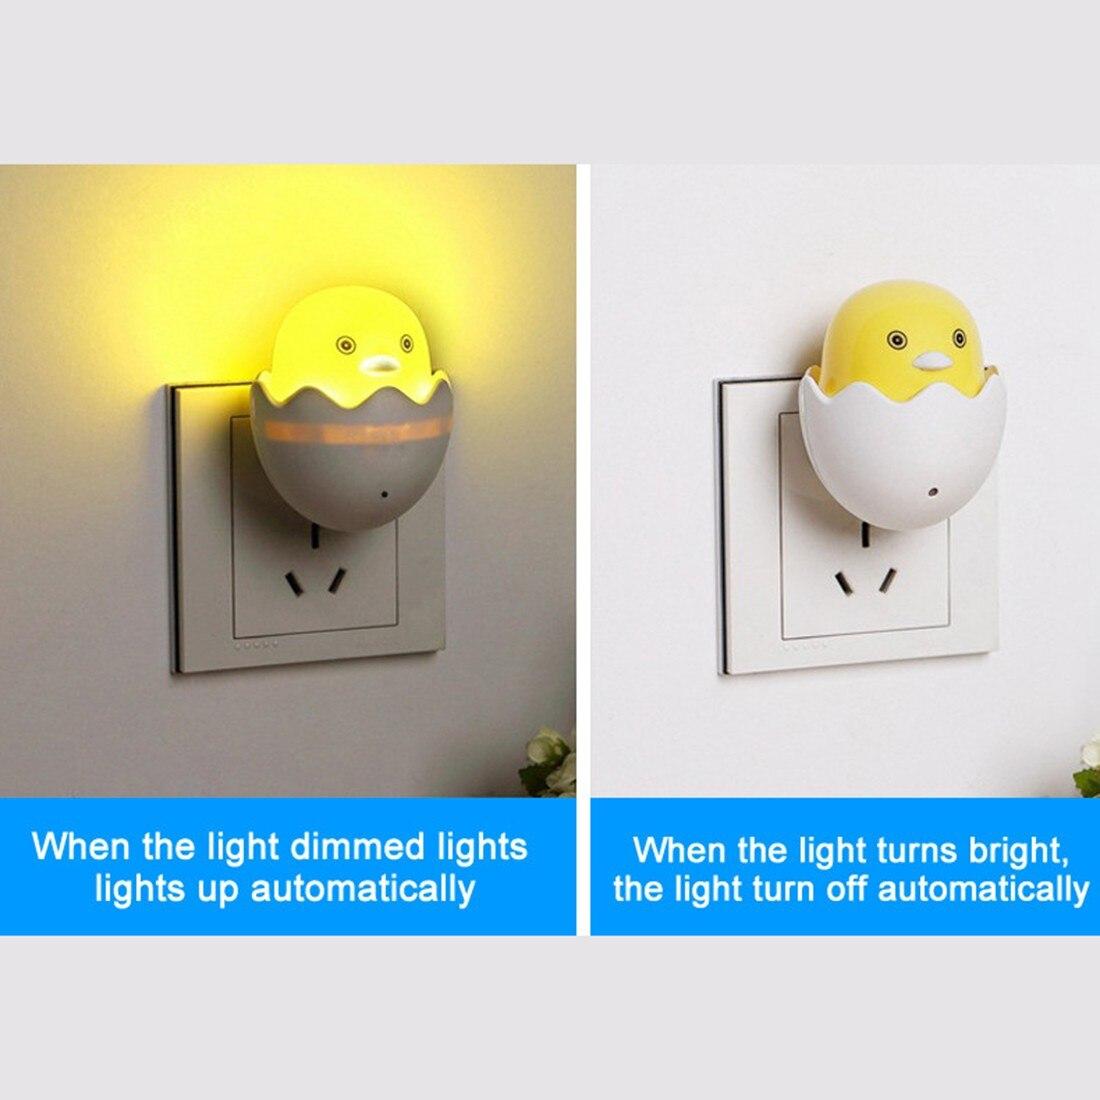 Cute EU Plug Wall Socket Lamps LED Night Light AC 220V Light Control Sensor Yellow Duck Bedroom Lamp Gift For Children